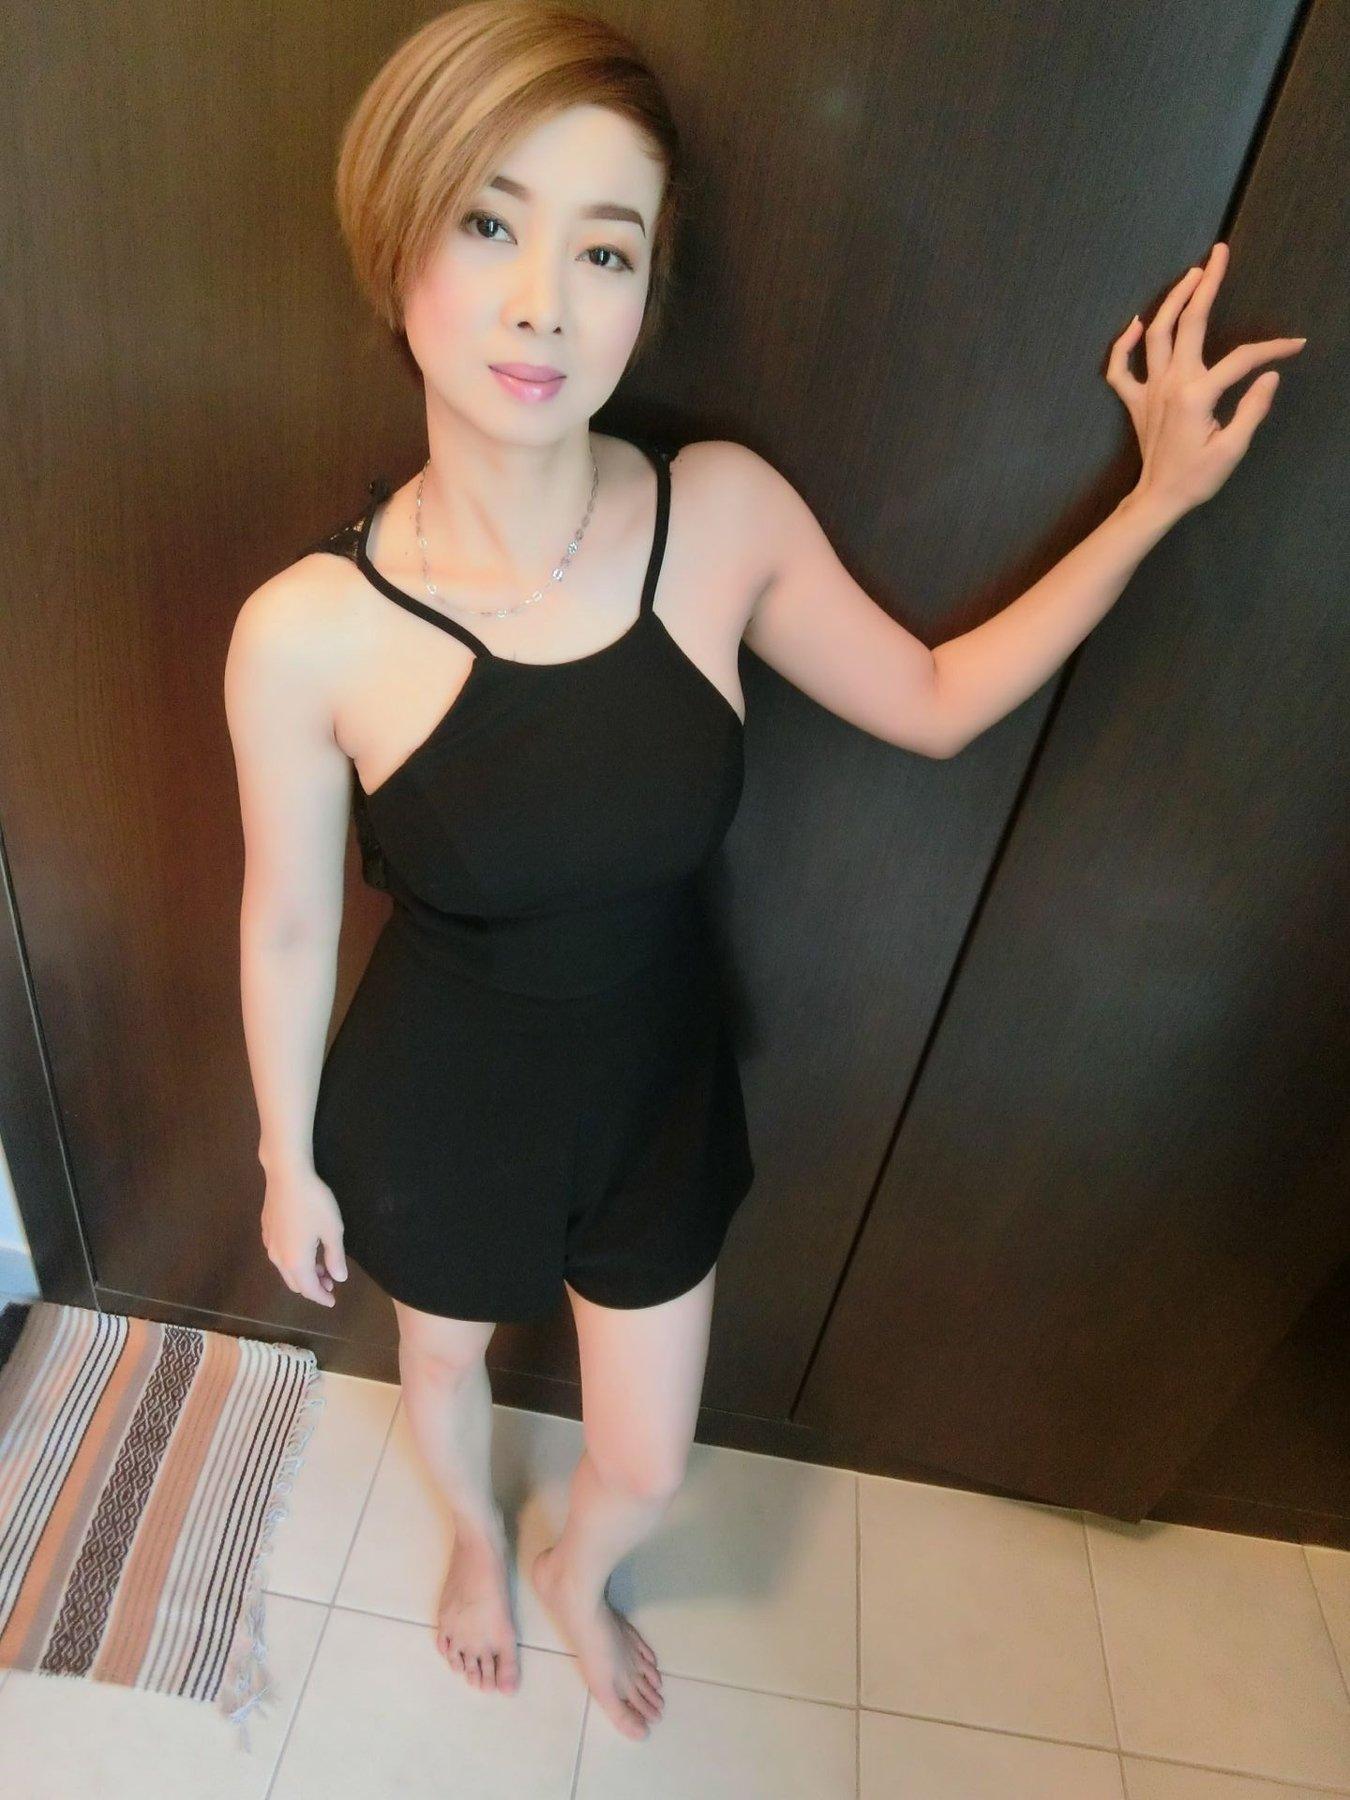 Skinny girl blowjobs